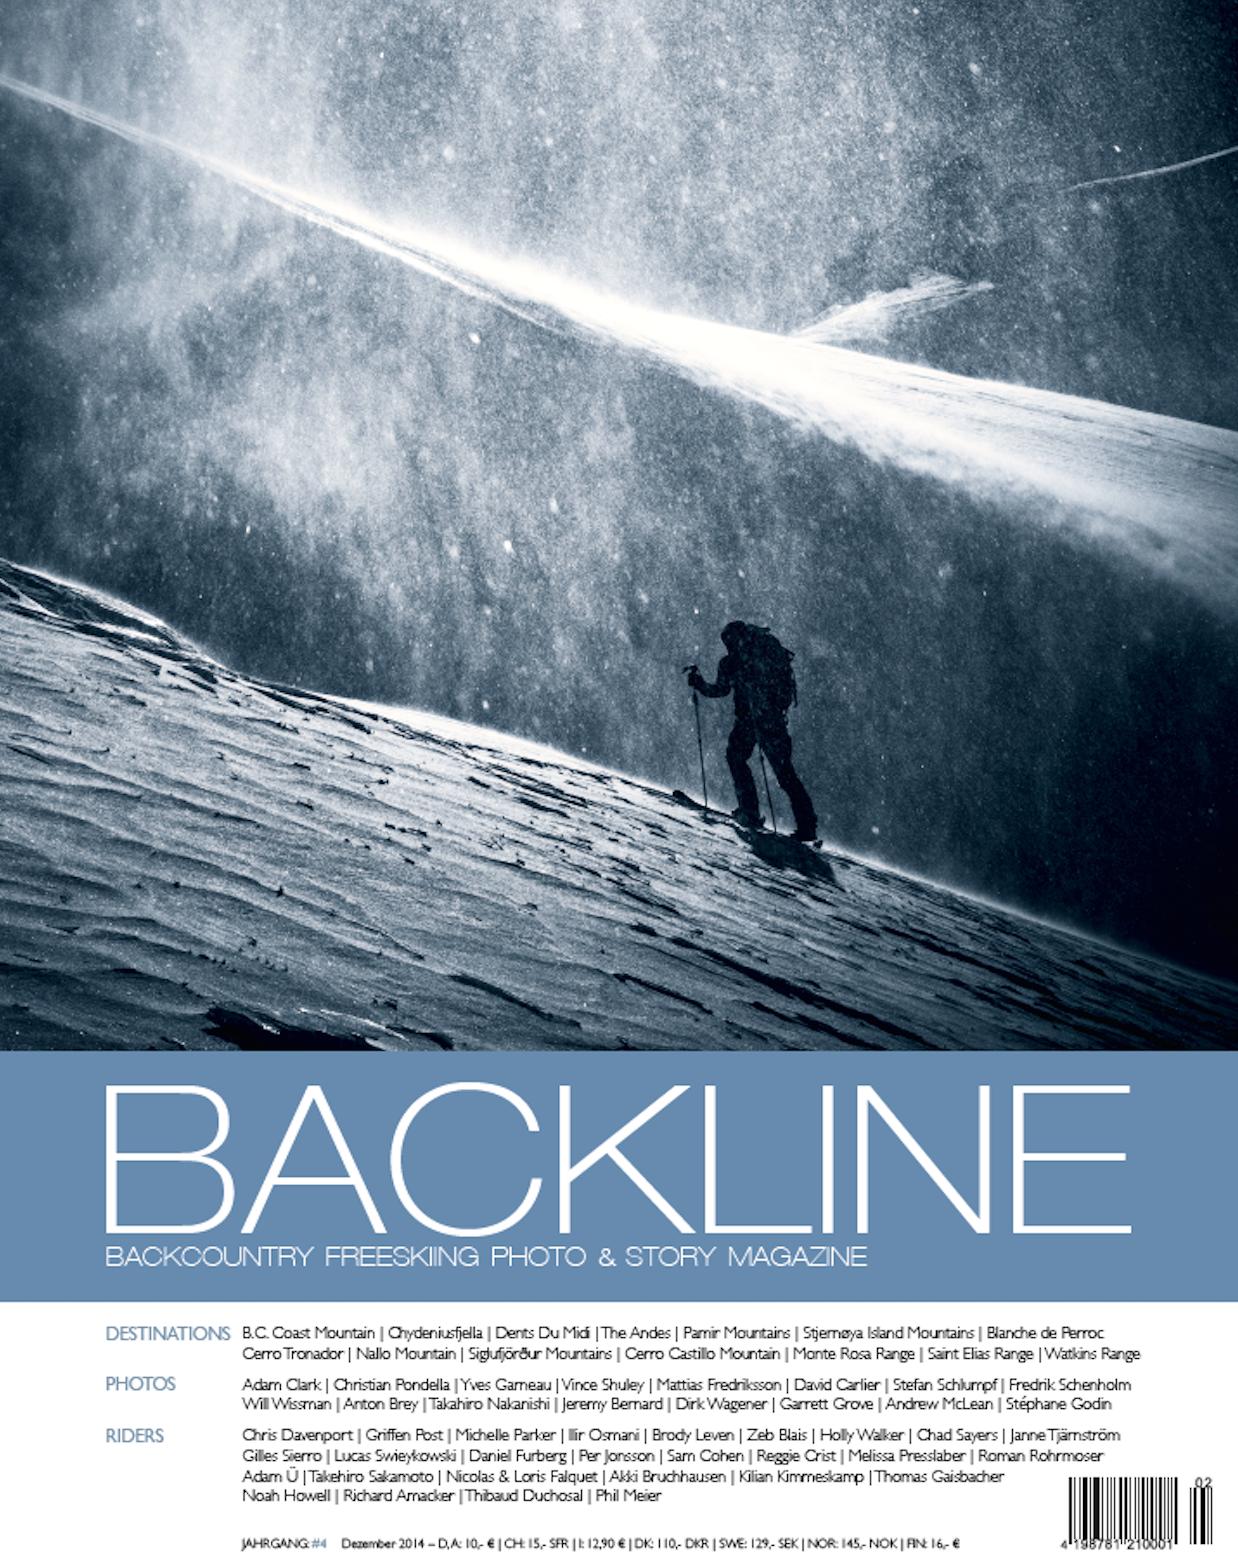 BACKLINE 2014